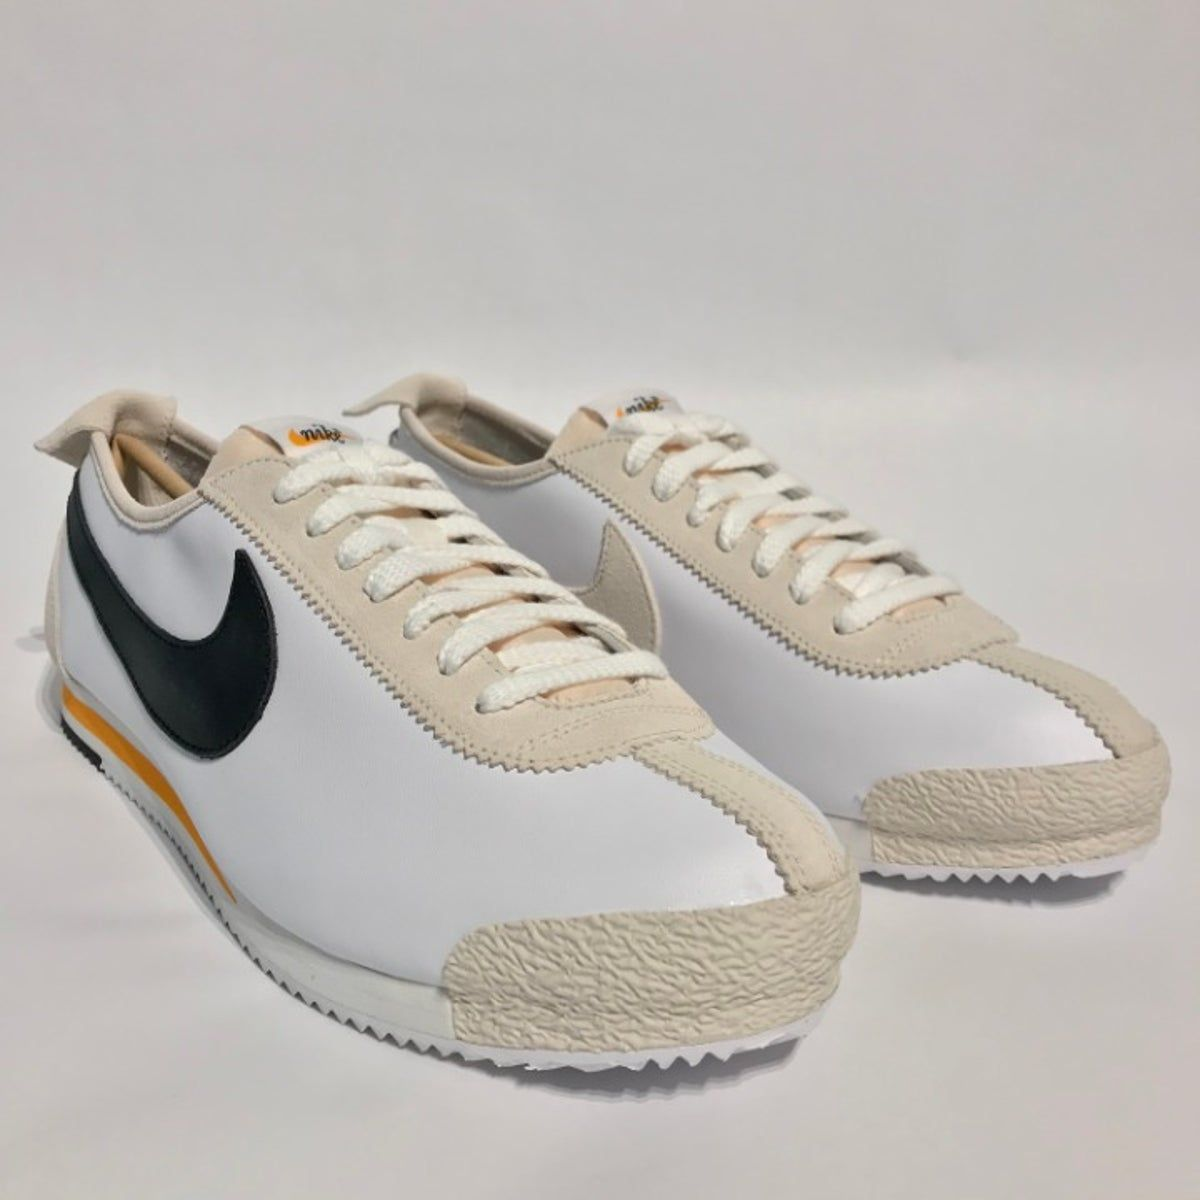 Nike Cortez \u0026lsquo;72 Blue Ribbon